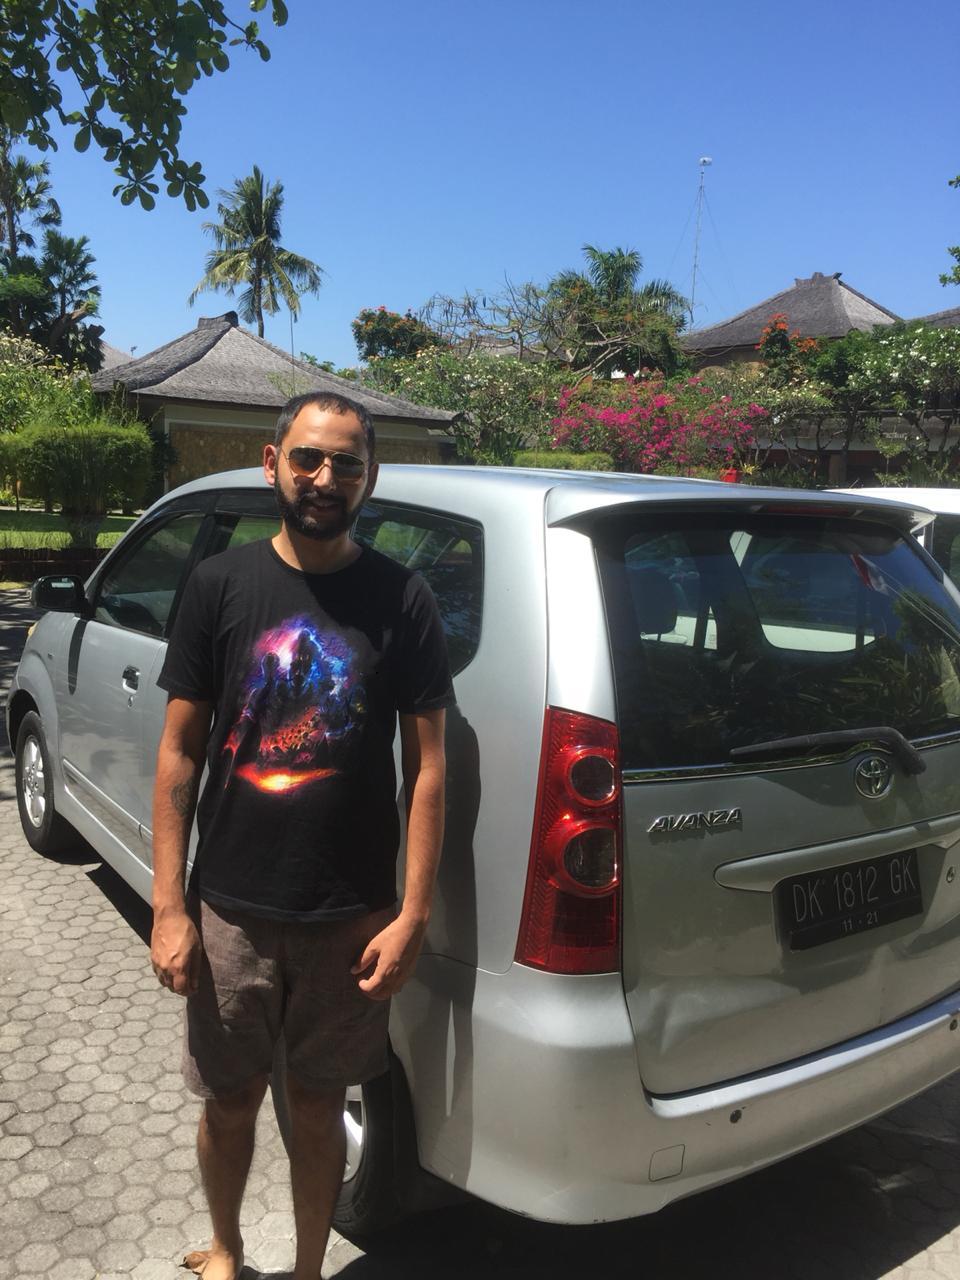 Sewa mobil bali, Sewa mobil murah di Bali, Sewa Mobil di Bandara Bali